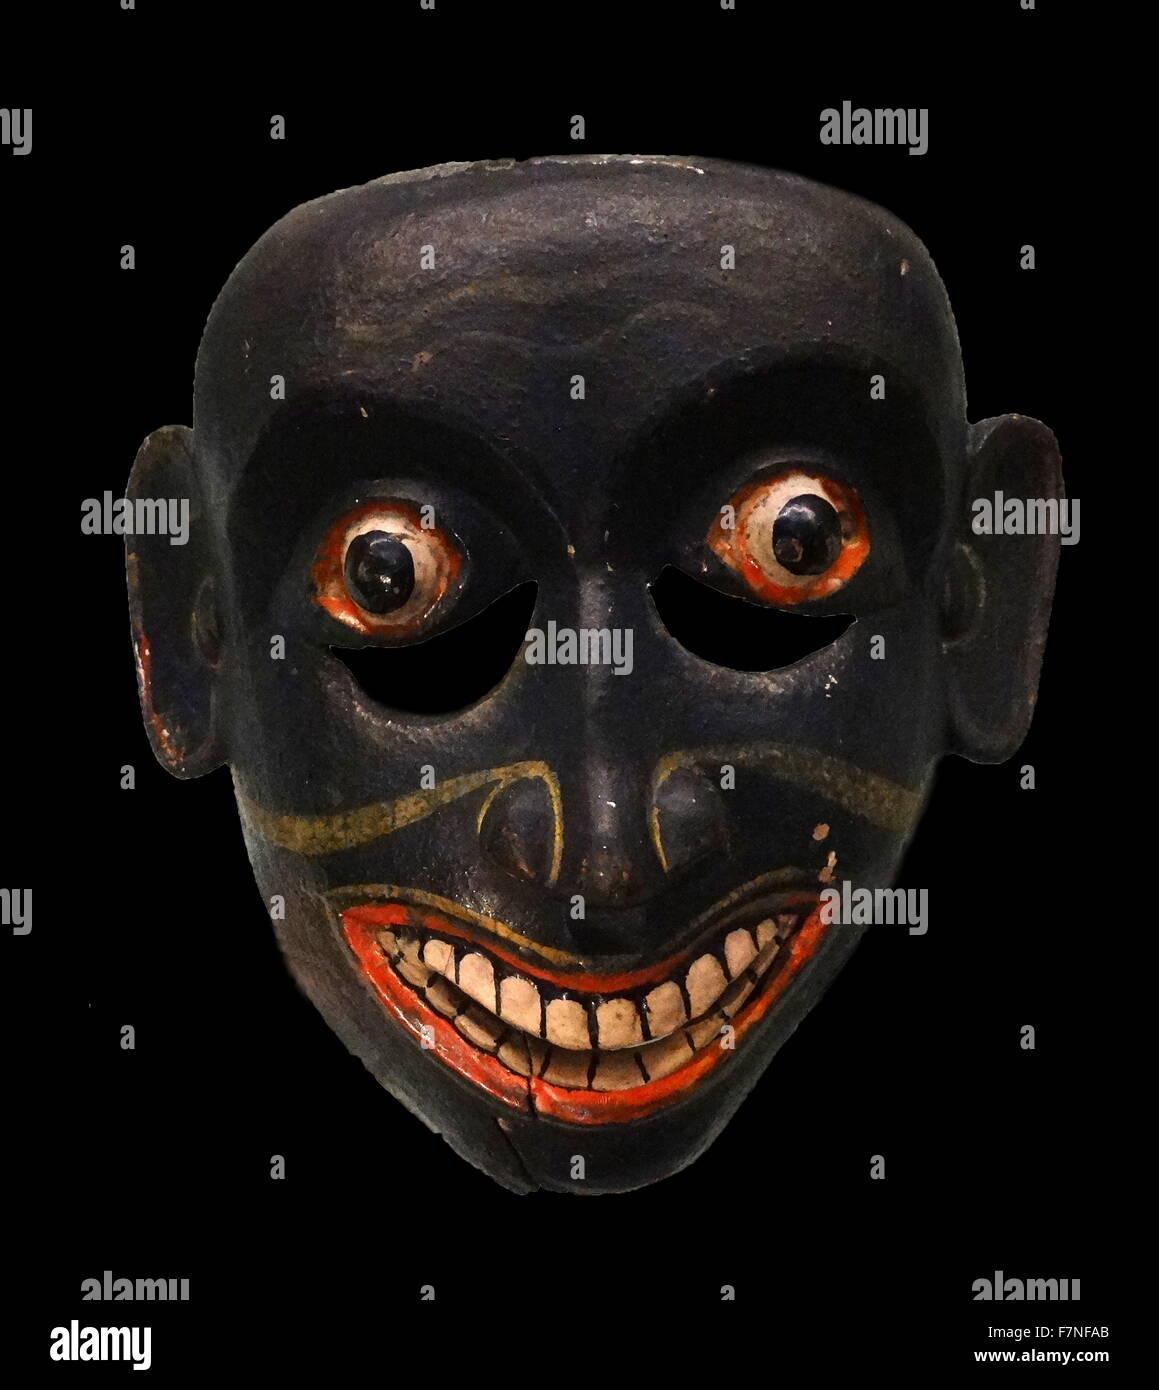 Maske repräsentieren einen Dämon passt, aus Sri Lanka zugeordnet. Datiert 1880 Stockbild